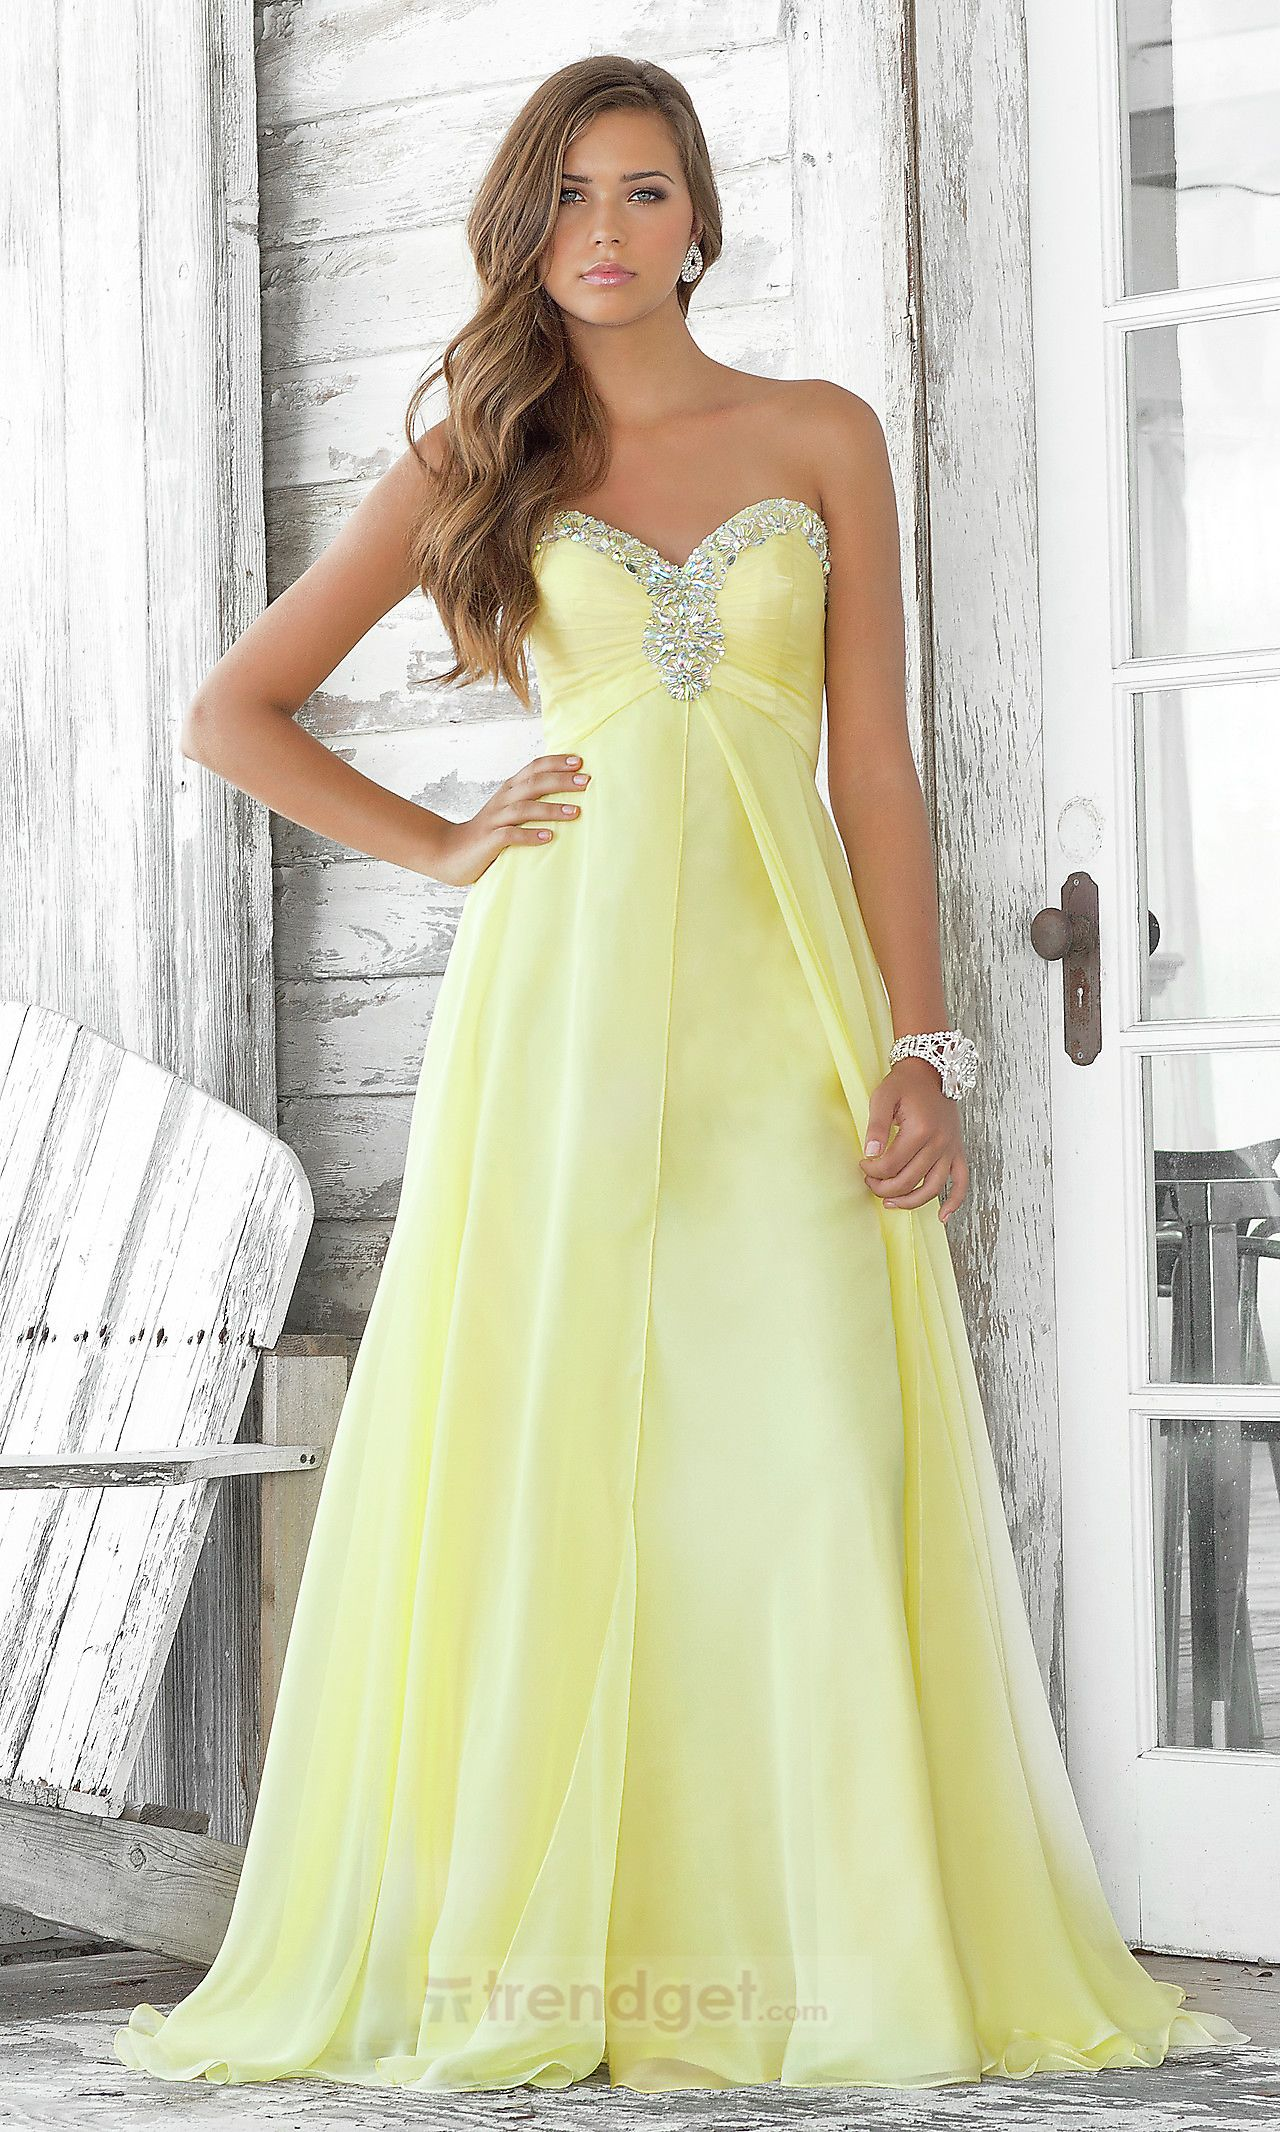 Simply A-line Sweetheart Floor-length Chiffon Colored Military Ball Dresses  - $120.99 - Trendget.com